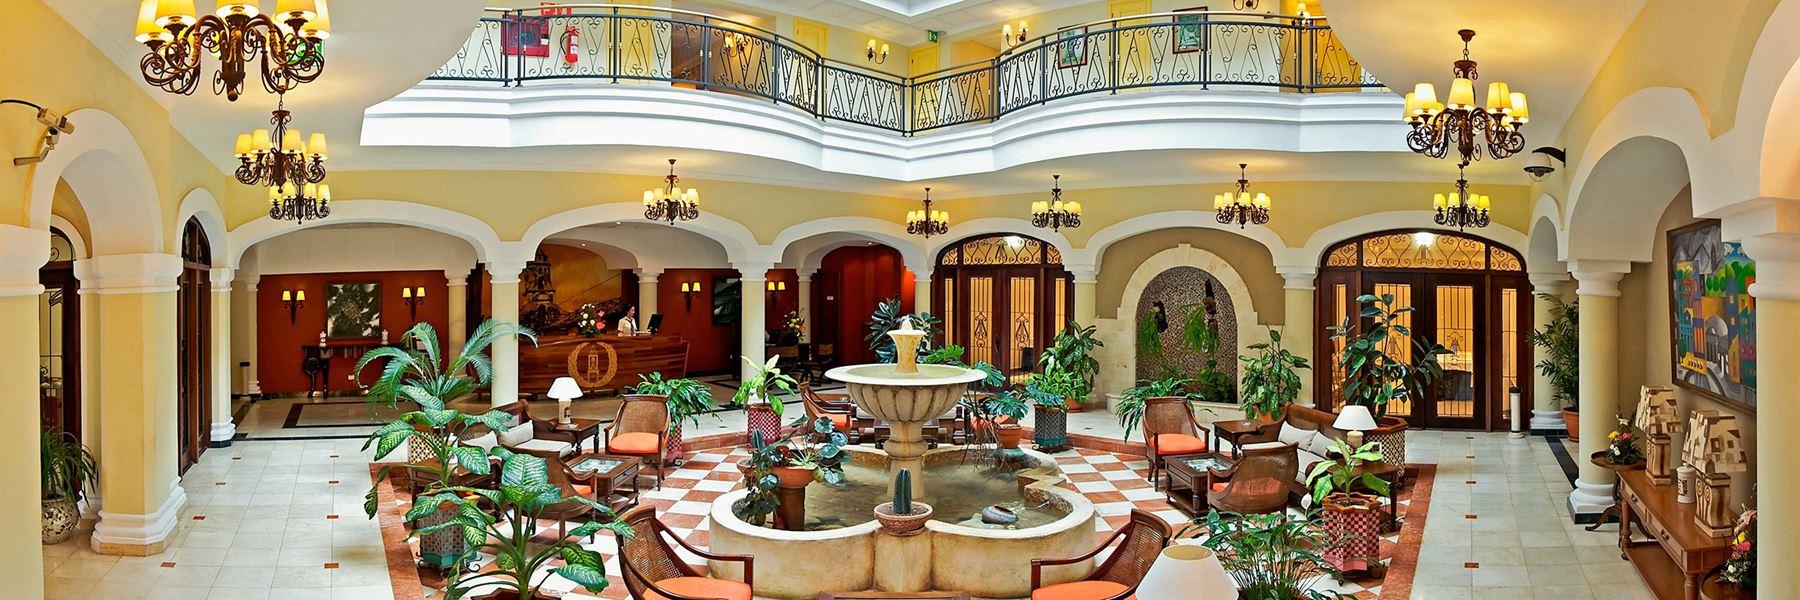 Iberostar_Grand_Hotel_Trinidad_457638.jpg